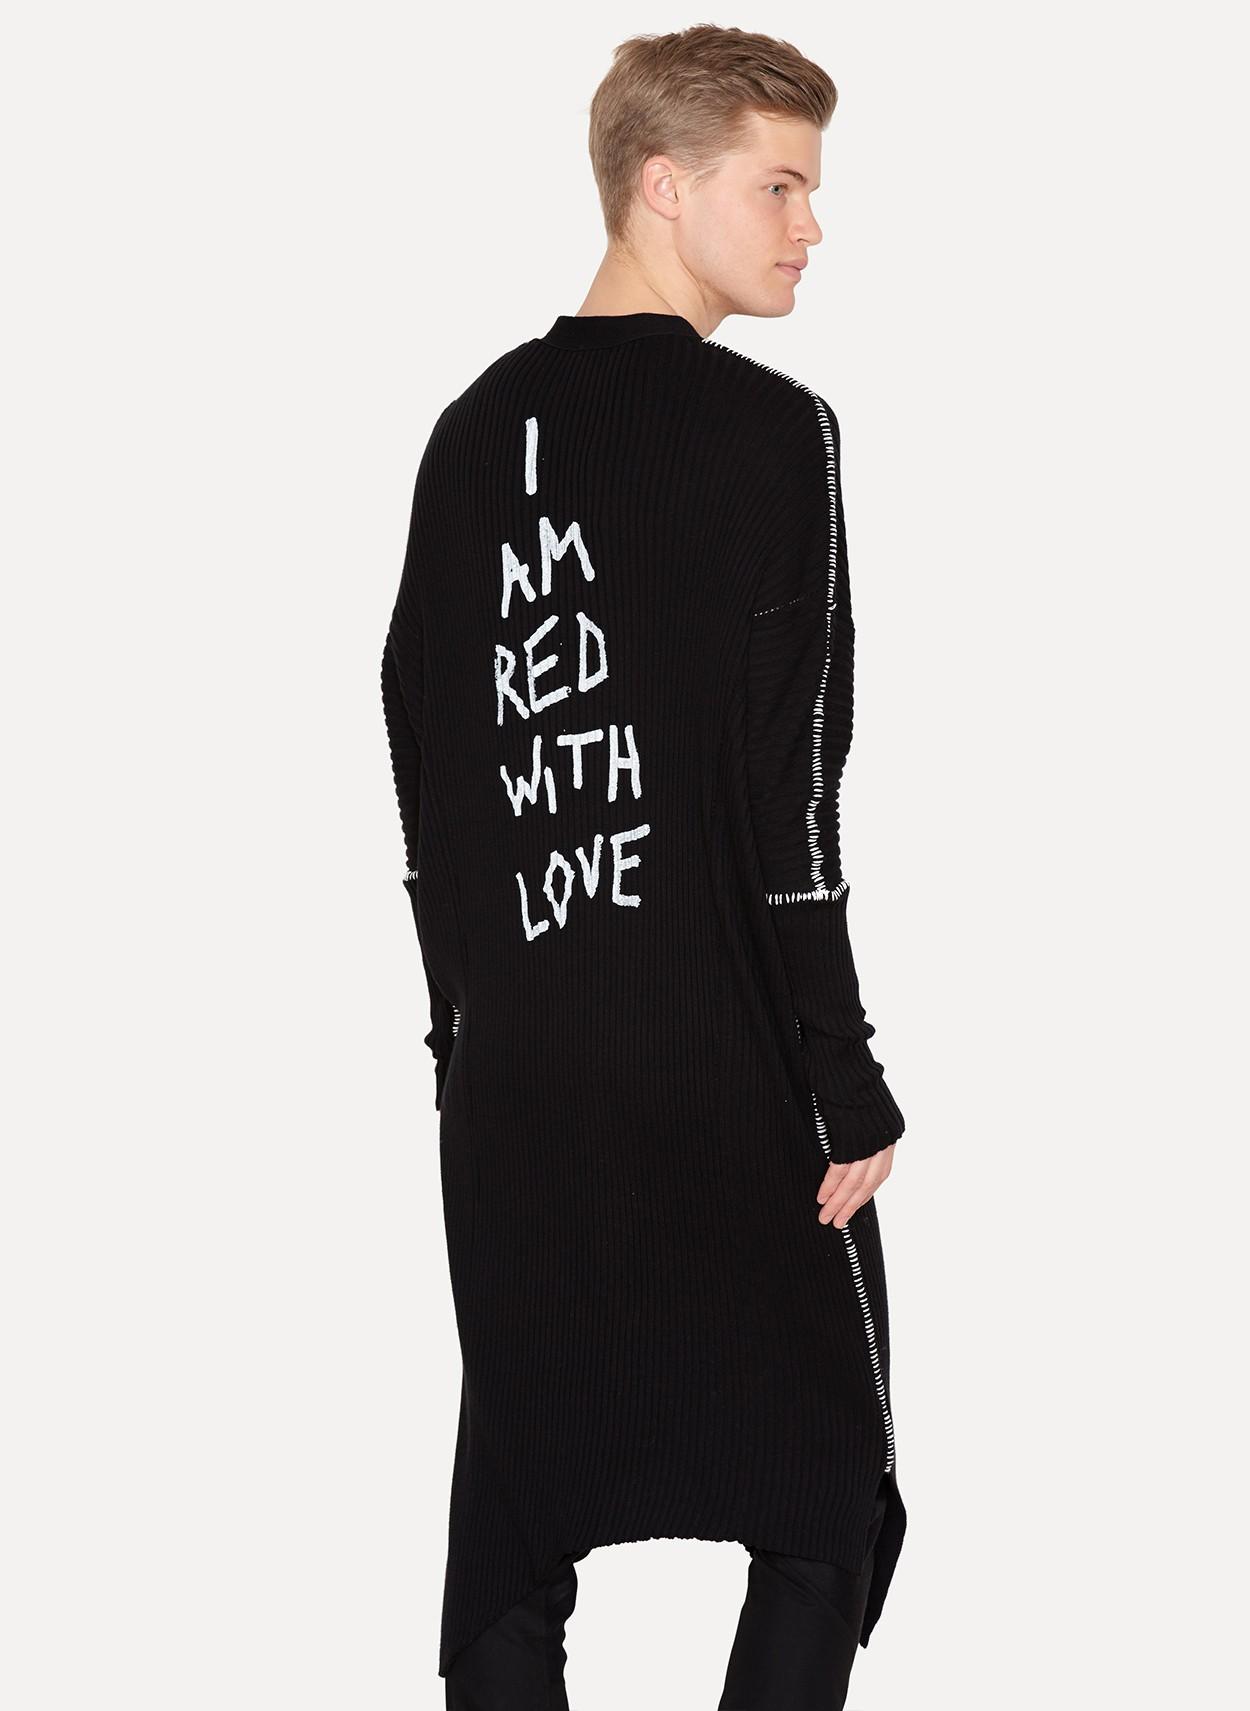 3935ff7376c Ann Demeulemeester Cotton Cashmere Long Knit Cardigan Taureg Black Print  Love Size s - Sweaters   Knitwear for Sale - Grailed